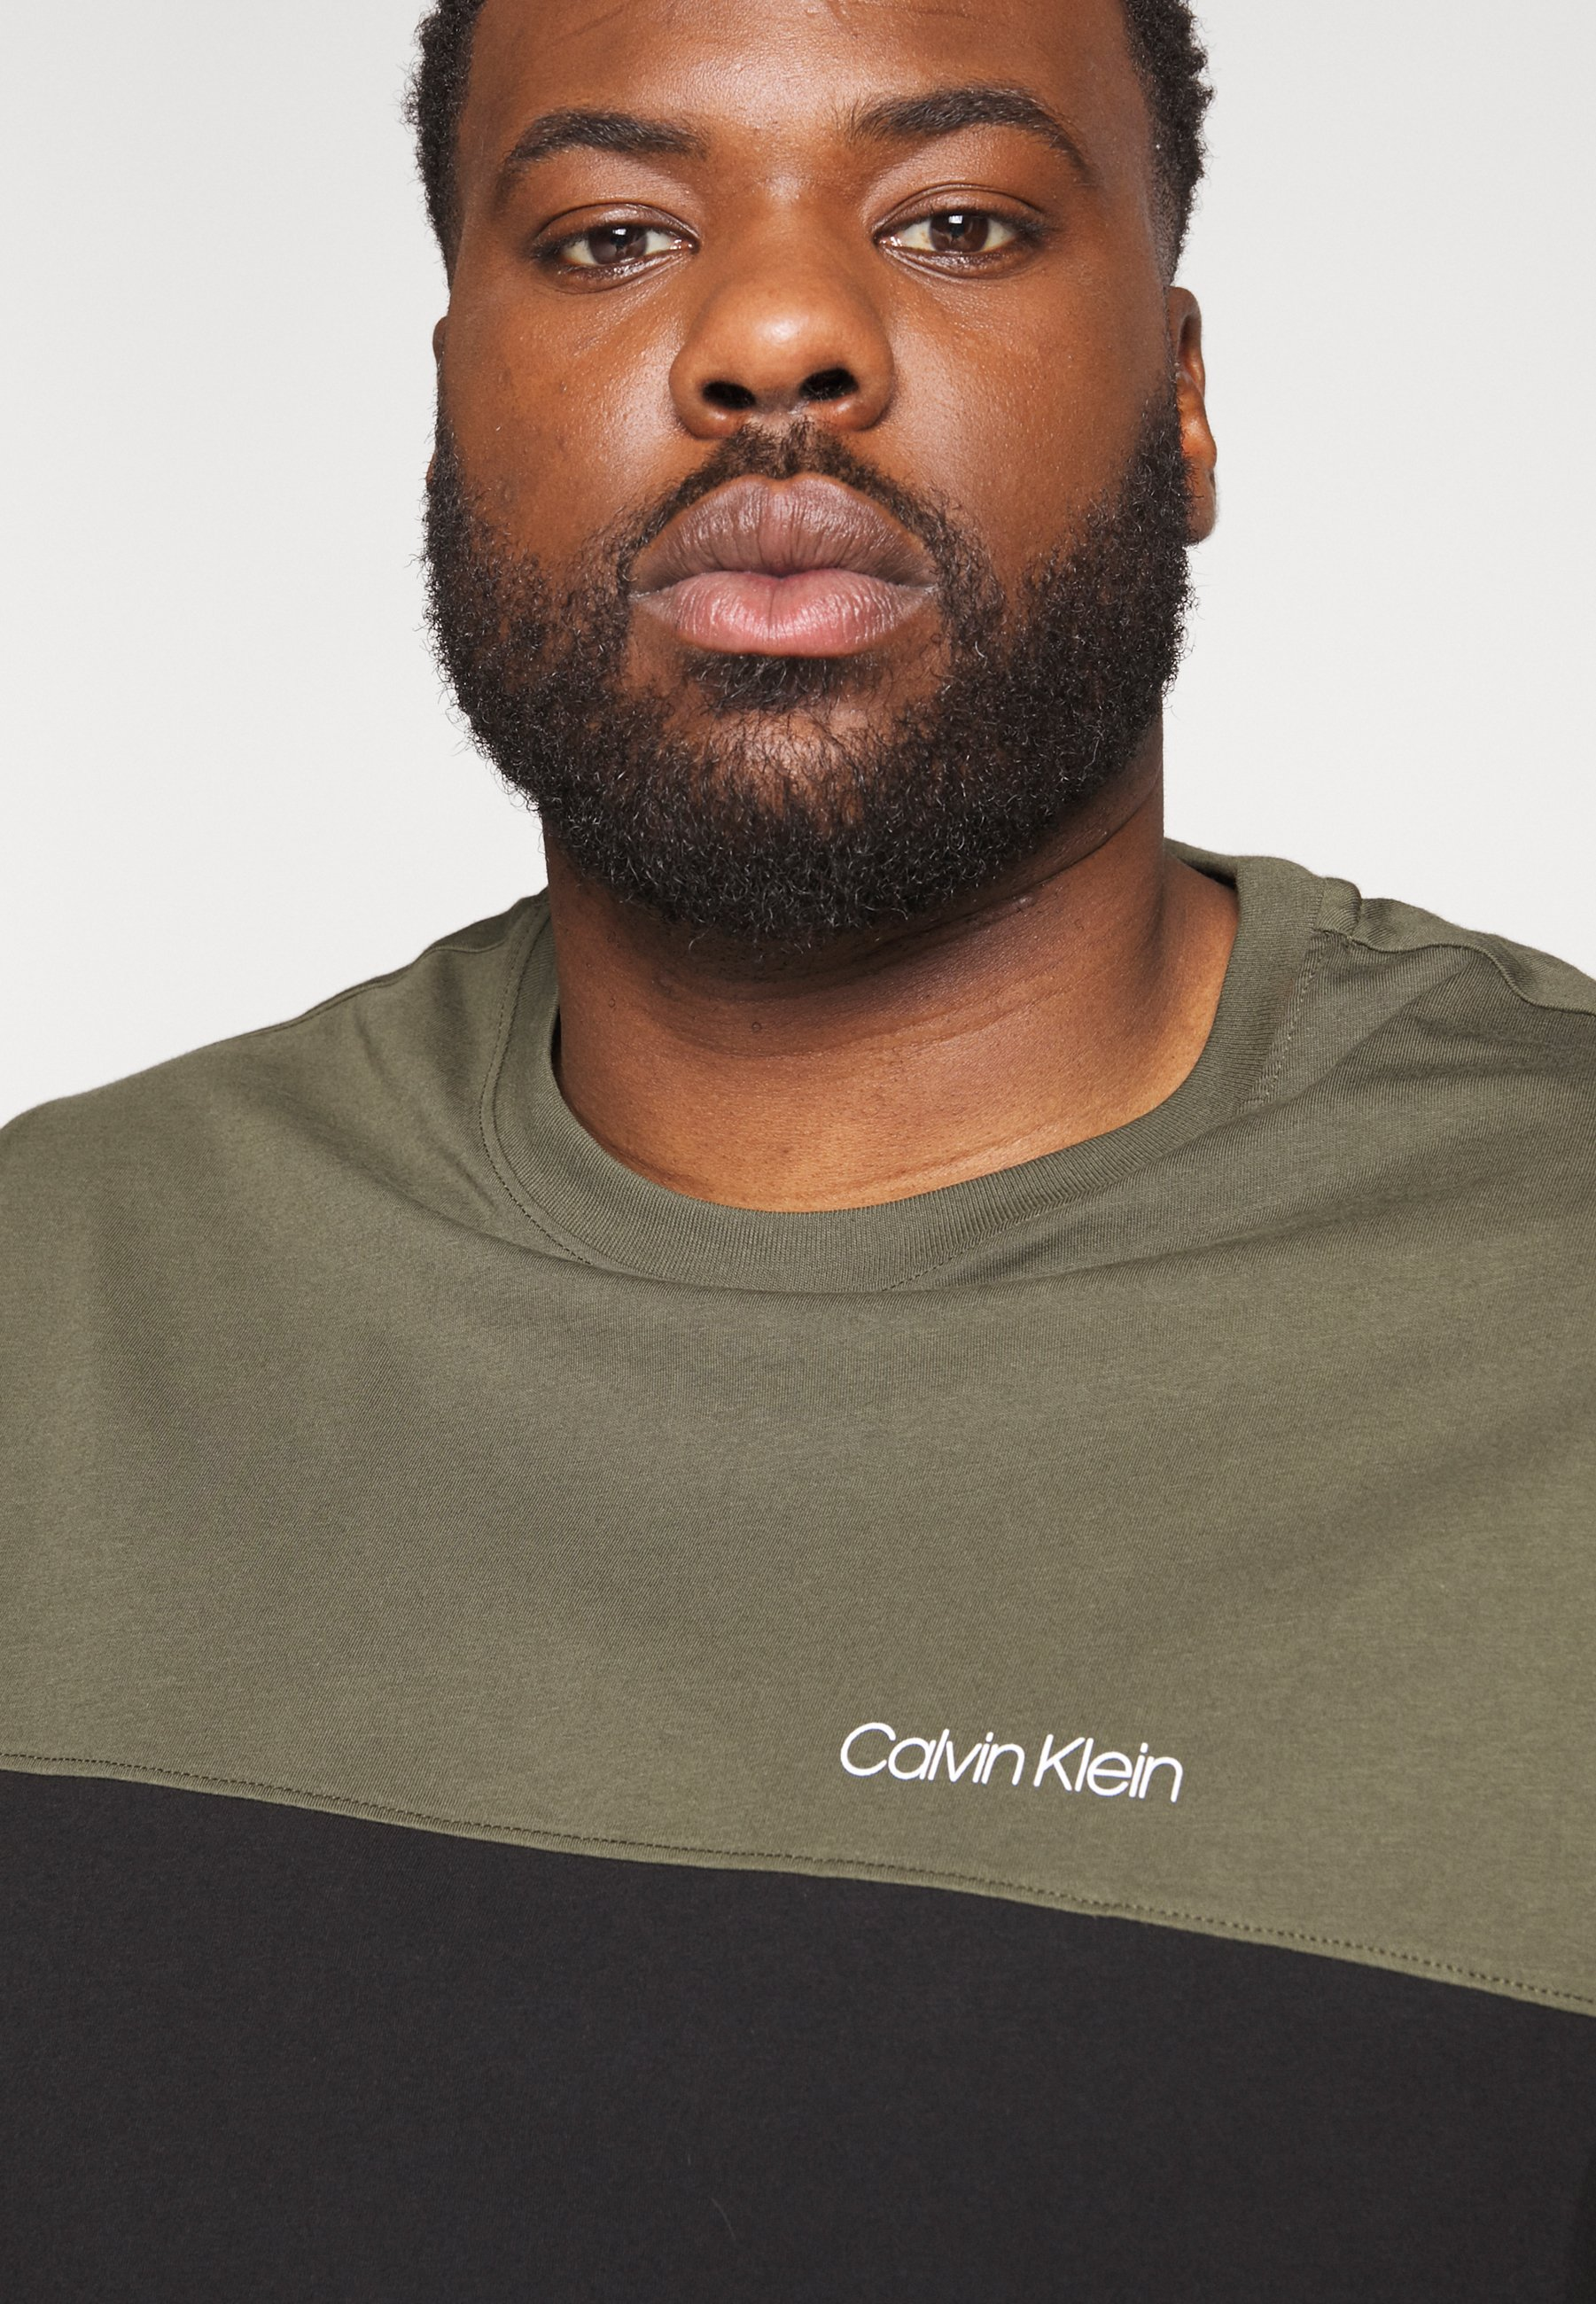 Calvin Klein Printtipaita - Black